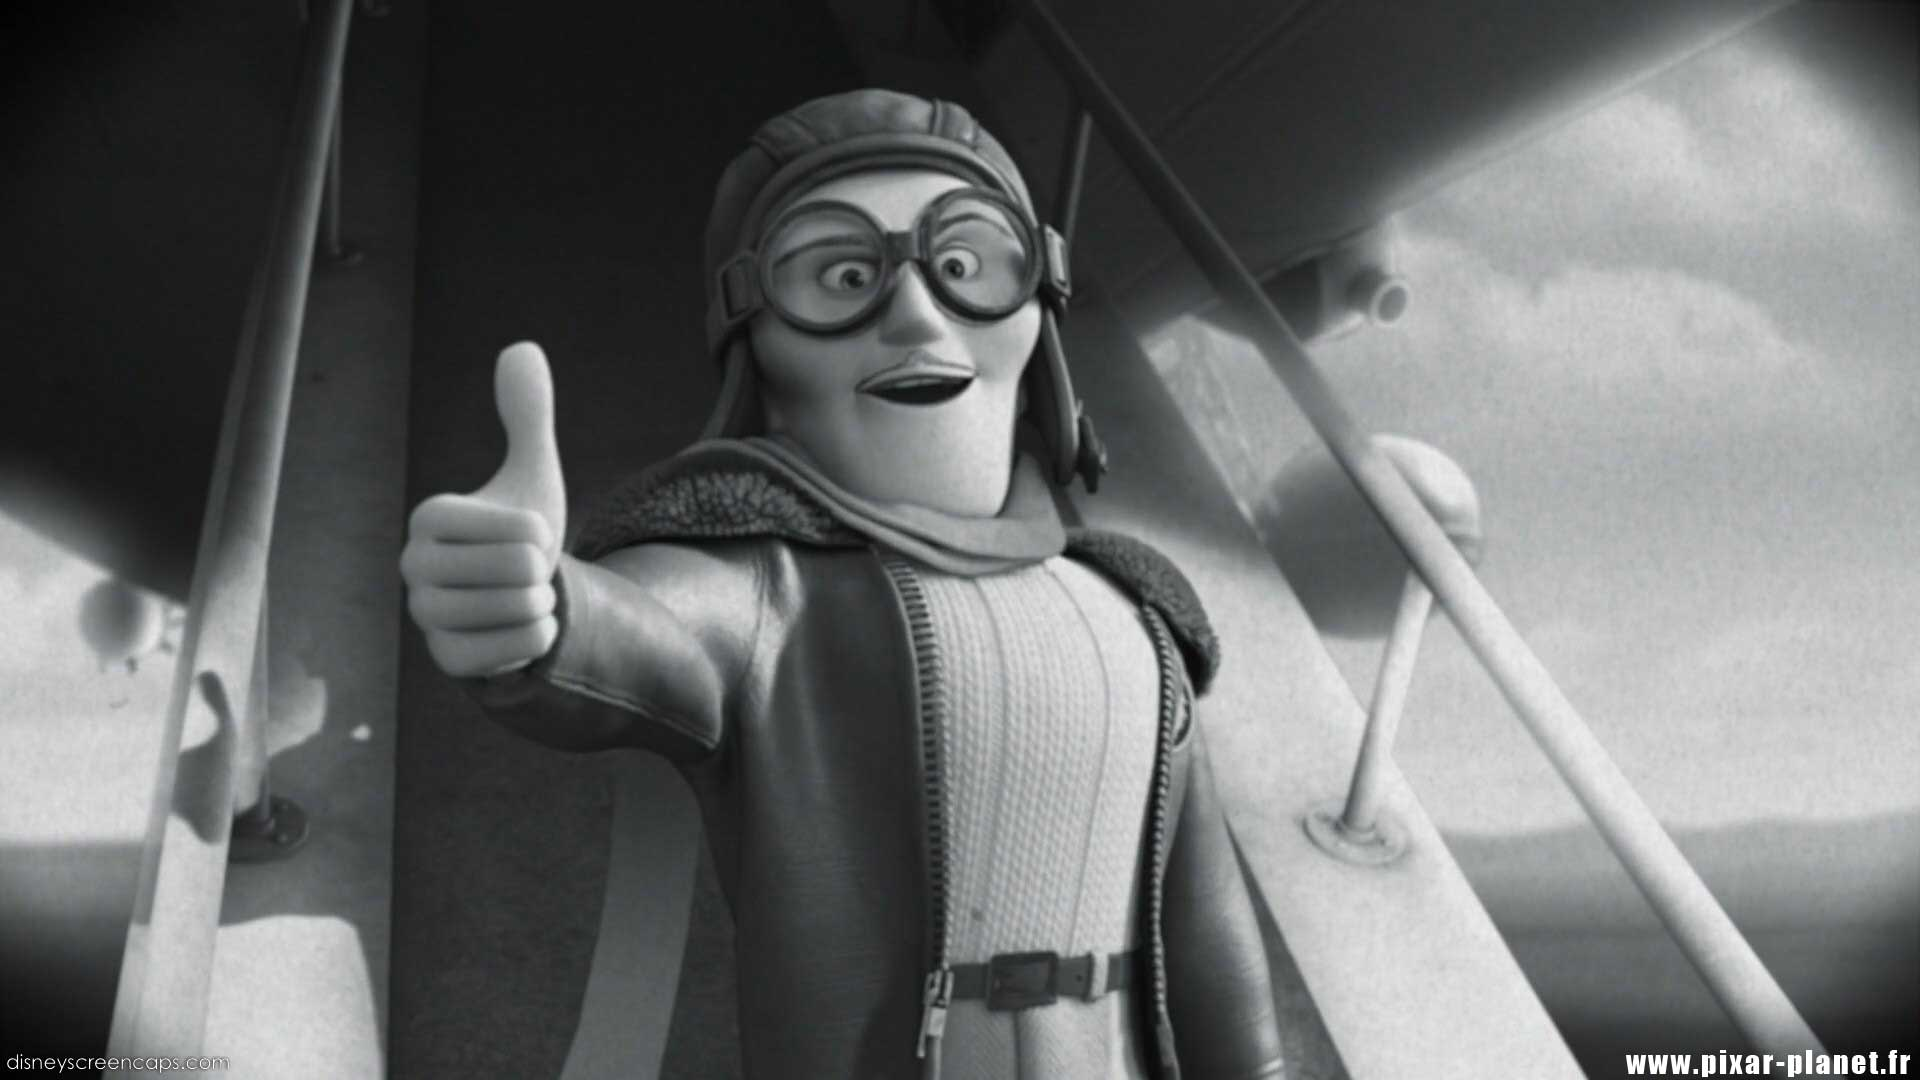 Pixar Planet Disney là haut up